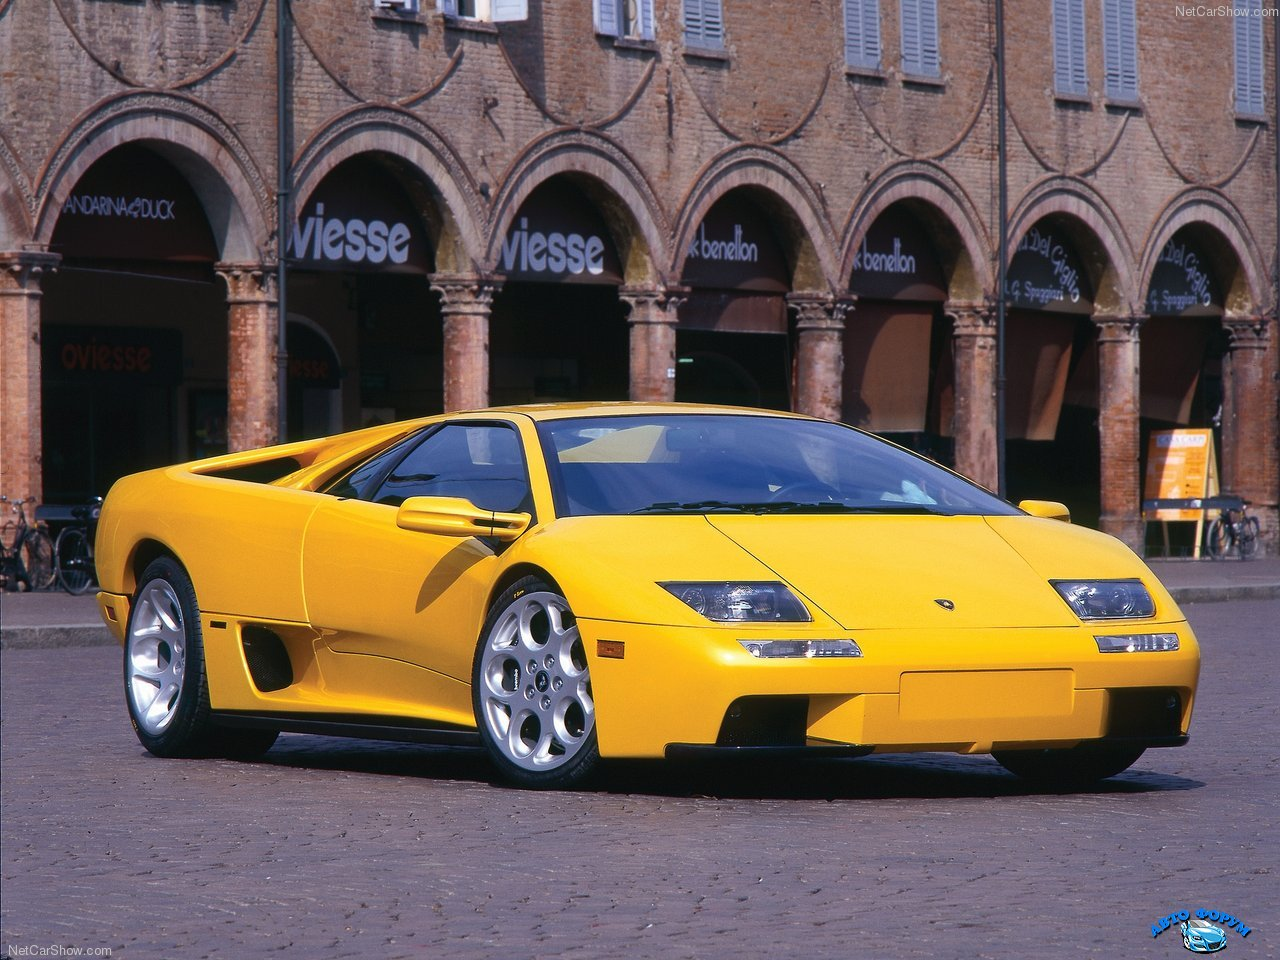 Lamborghini-Diablo_6.0_2001_1280x960_wallpaper_01.jpg